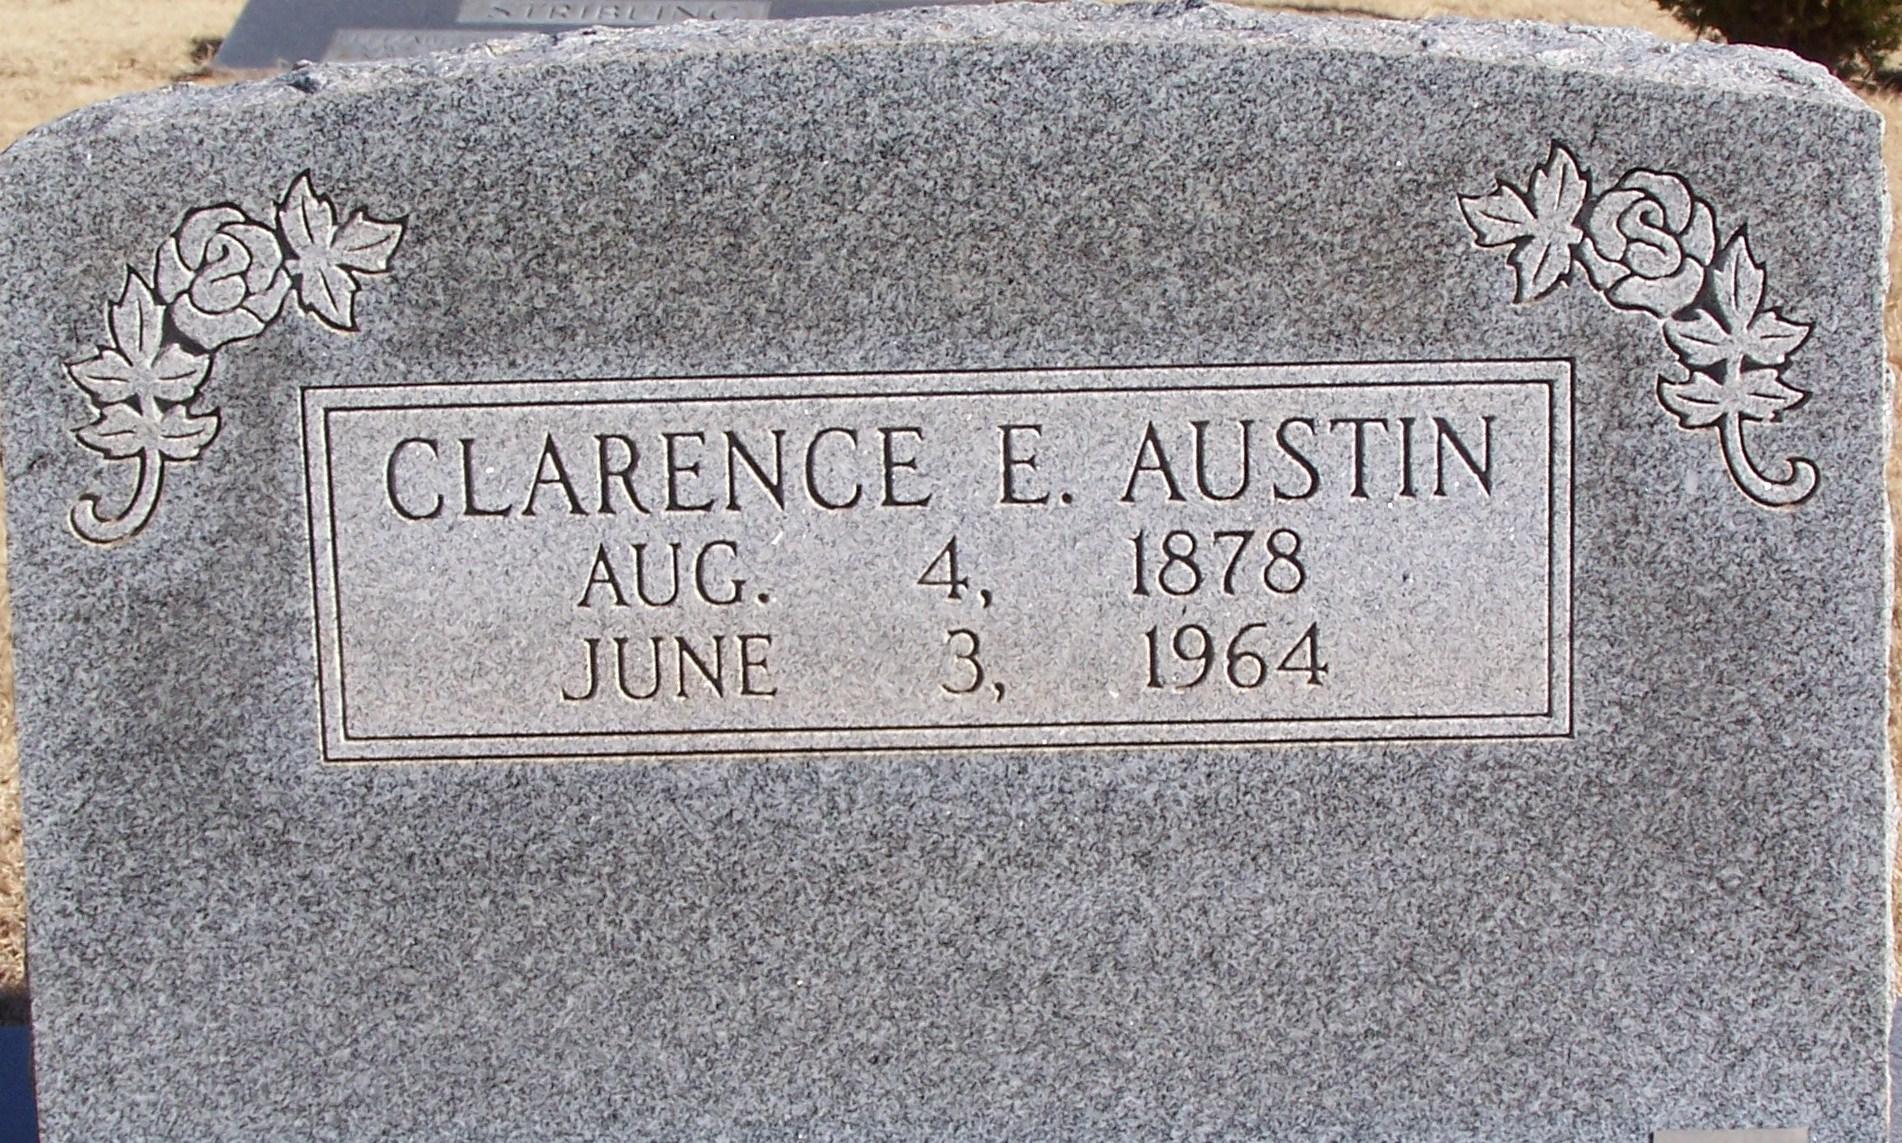 Clarence E. Austin